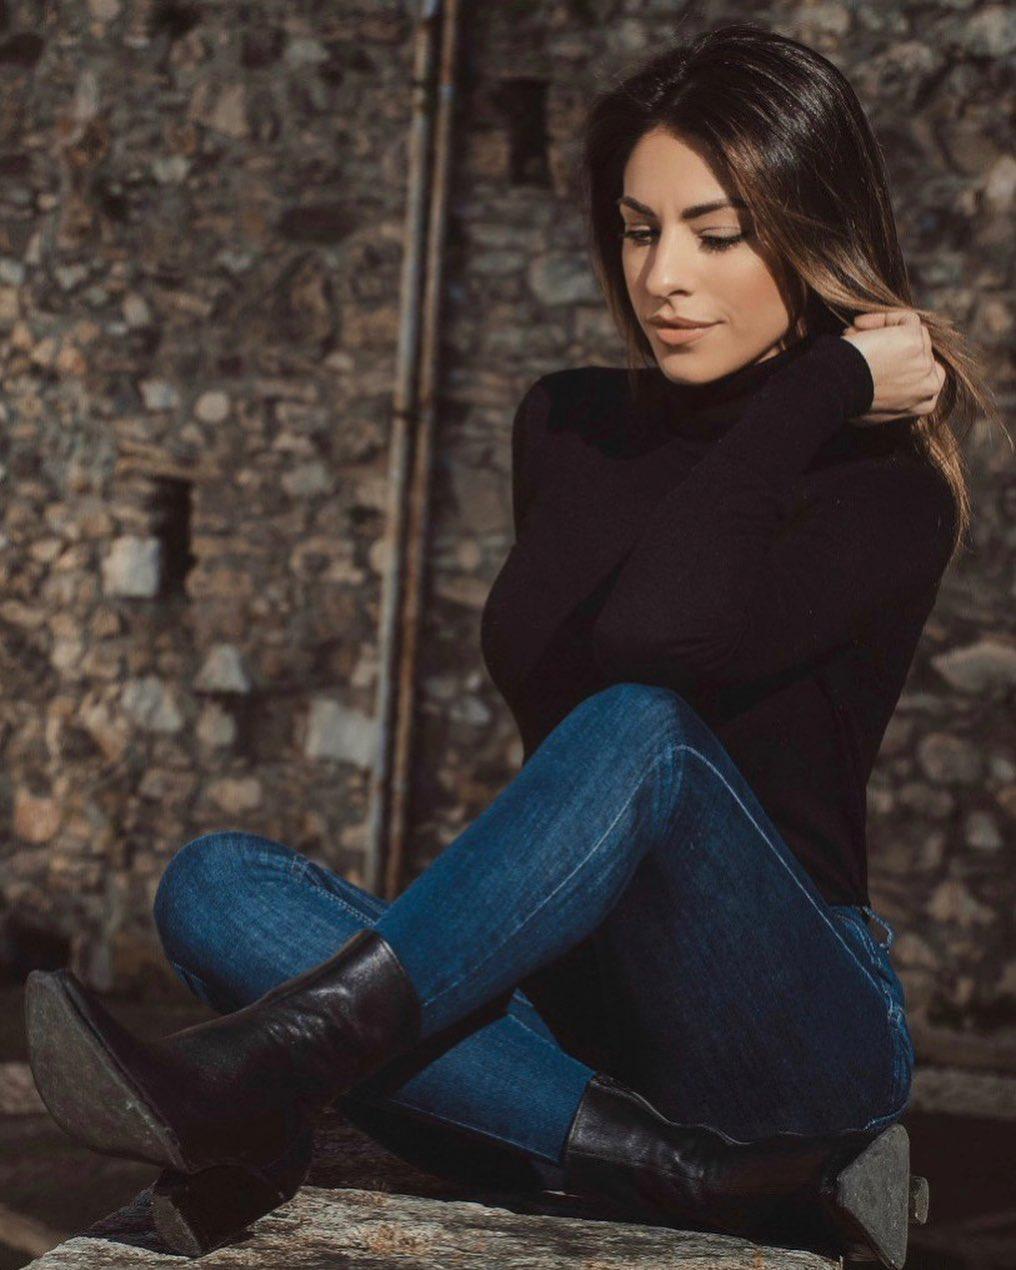 Elena-Cianni-Wallpapers-Insta-Fit-Bio-8